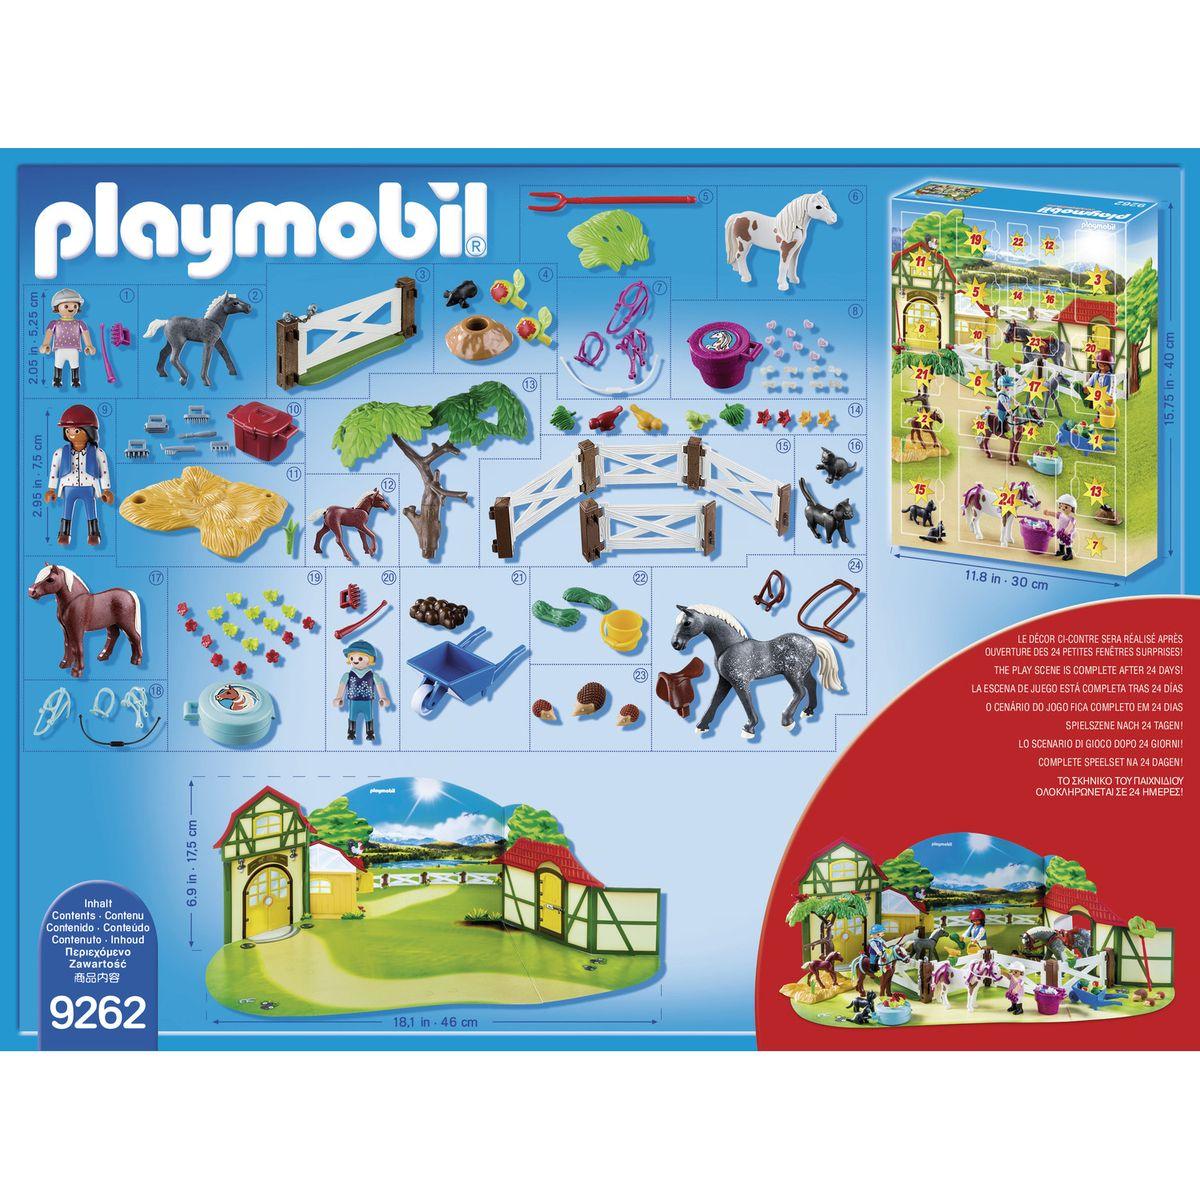 Calendrier L Avent Playmobil.Playmobil Christmas Calendrier De L Avent Centre Equestre 9262